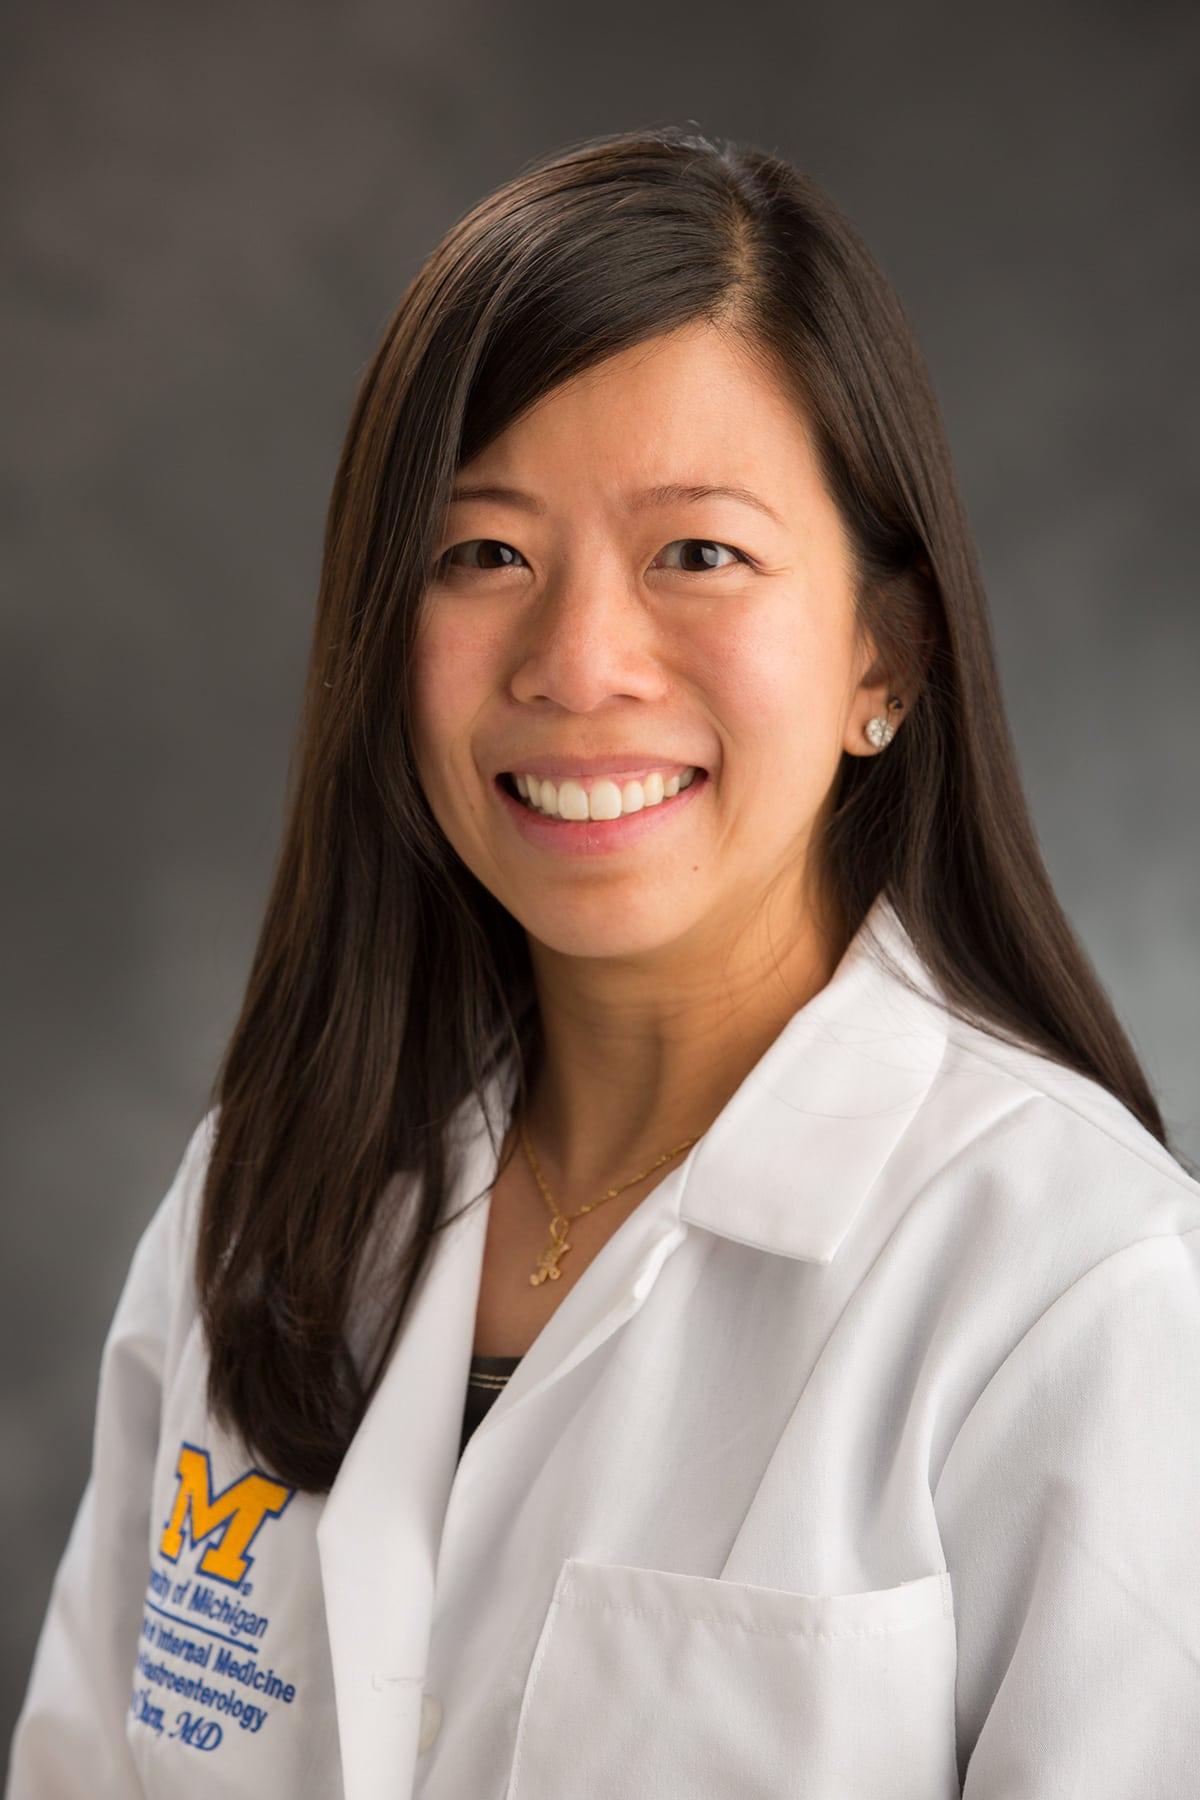 Joan Chen, UM Medical Group - Gastroenterology Doctor in Ann